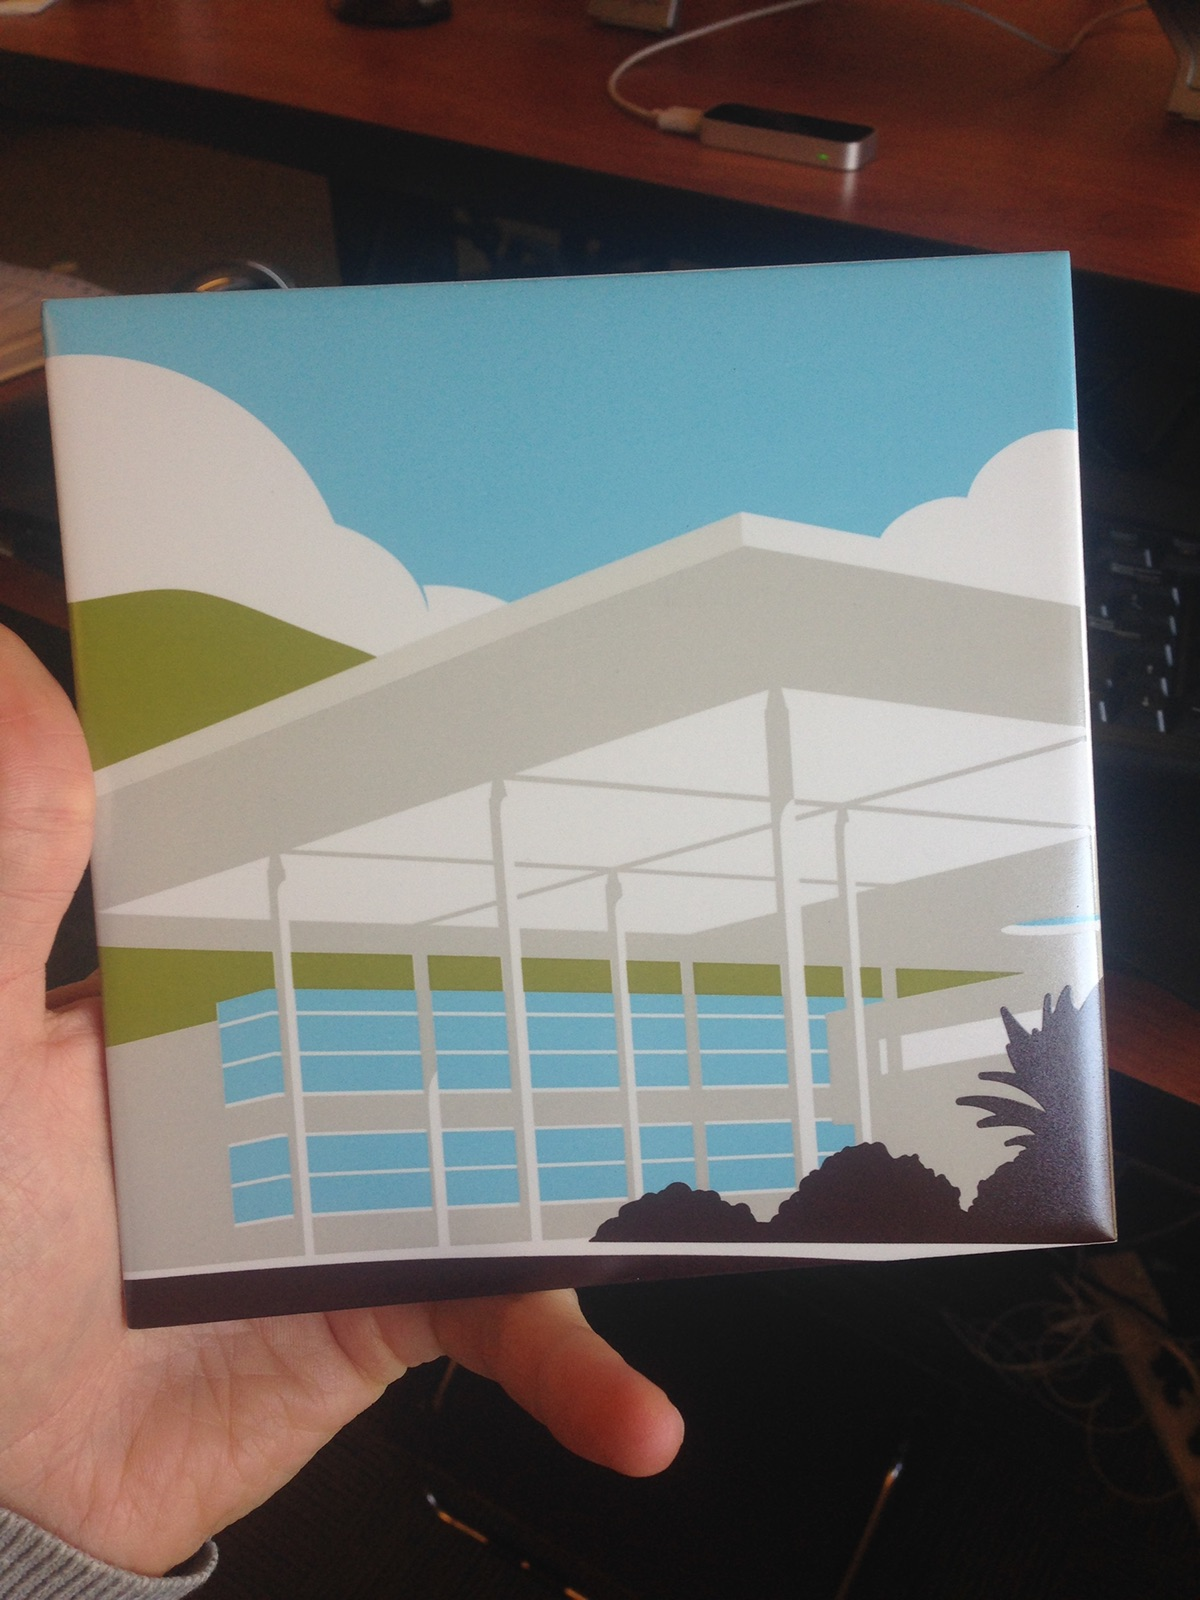 Promotional limited edition lapel pin ceramic tile Landmarks